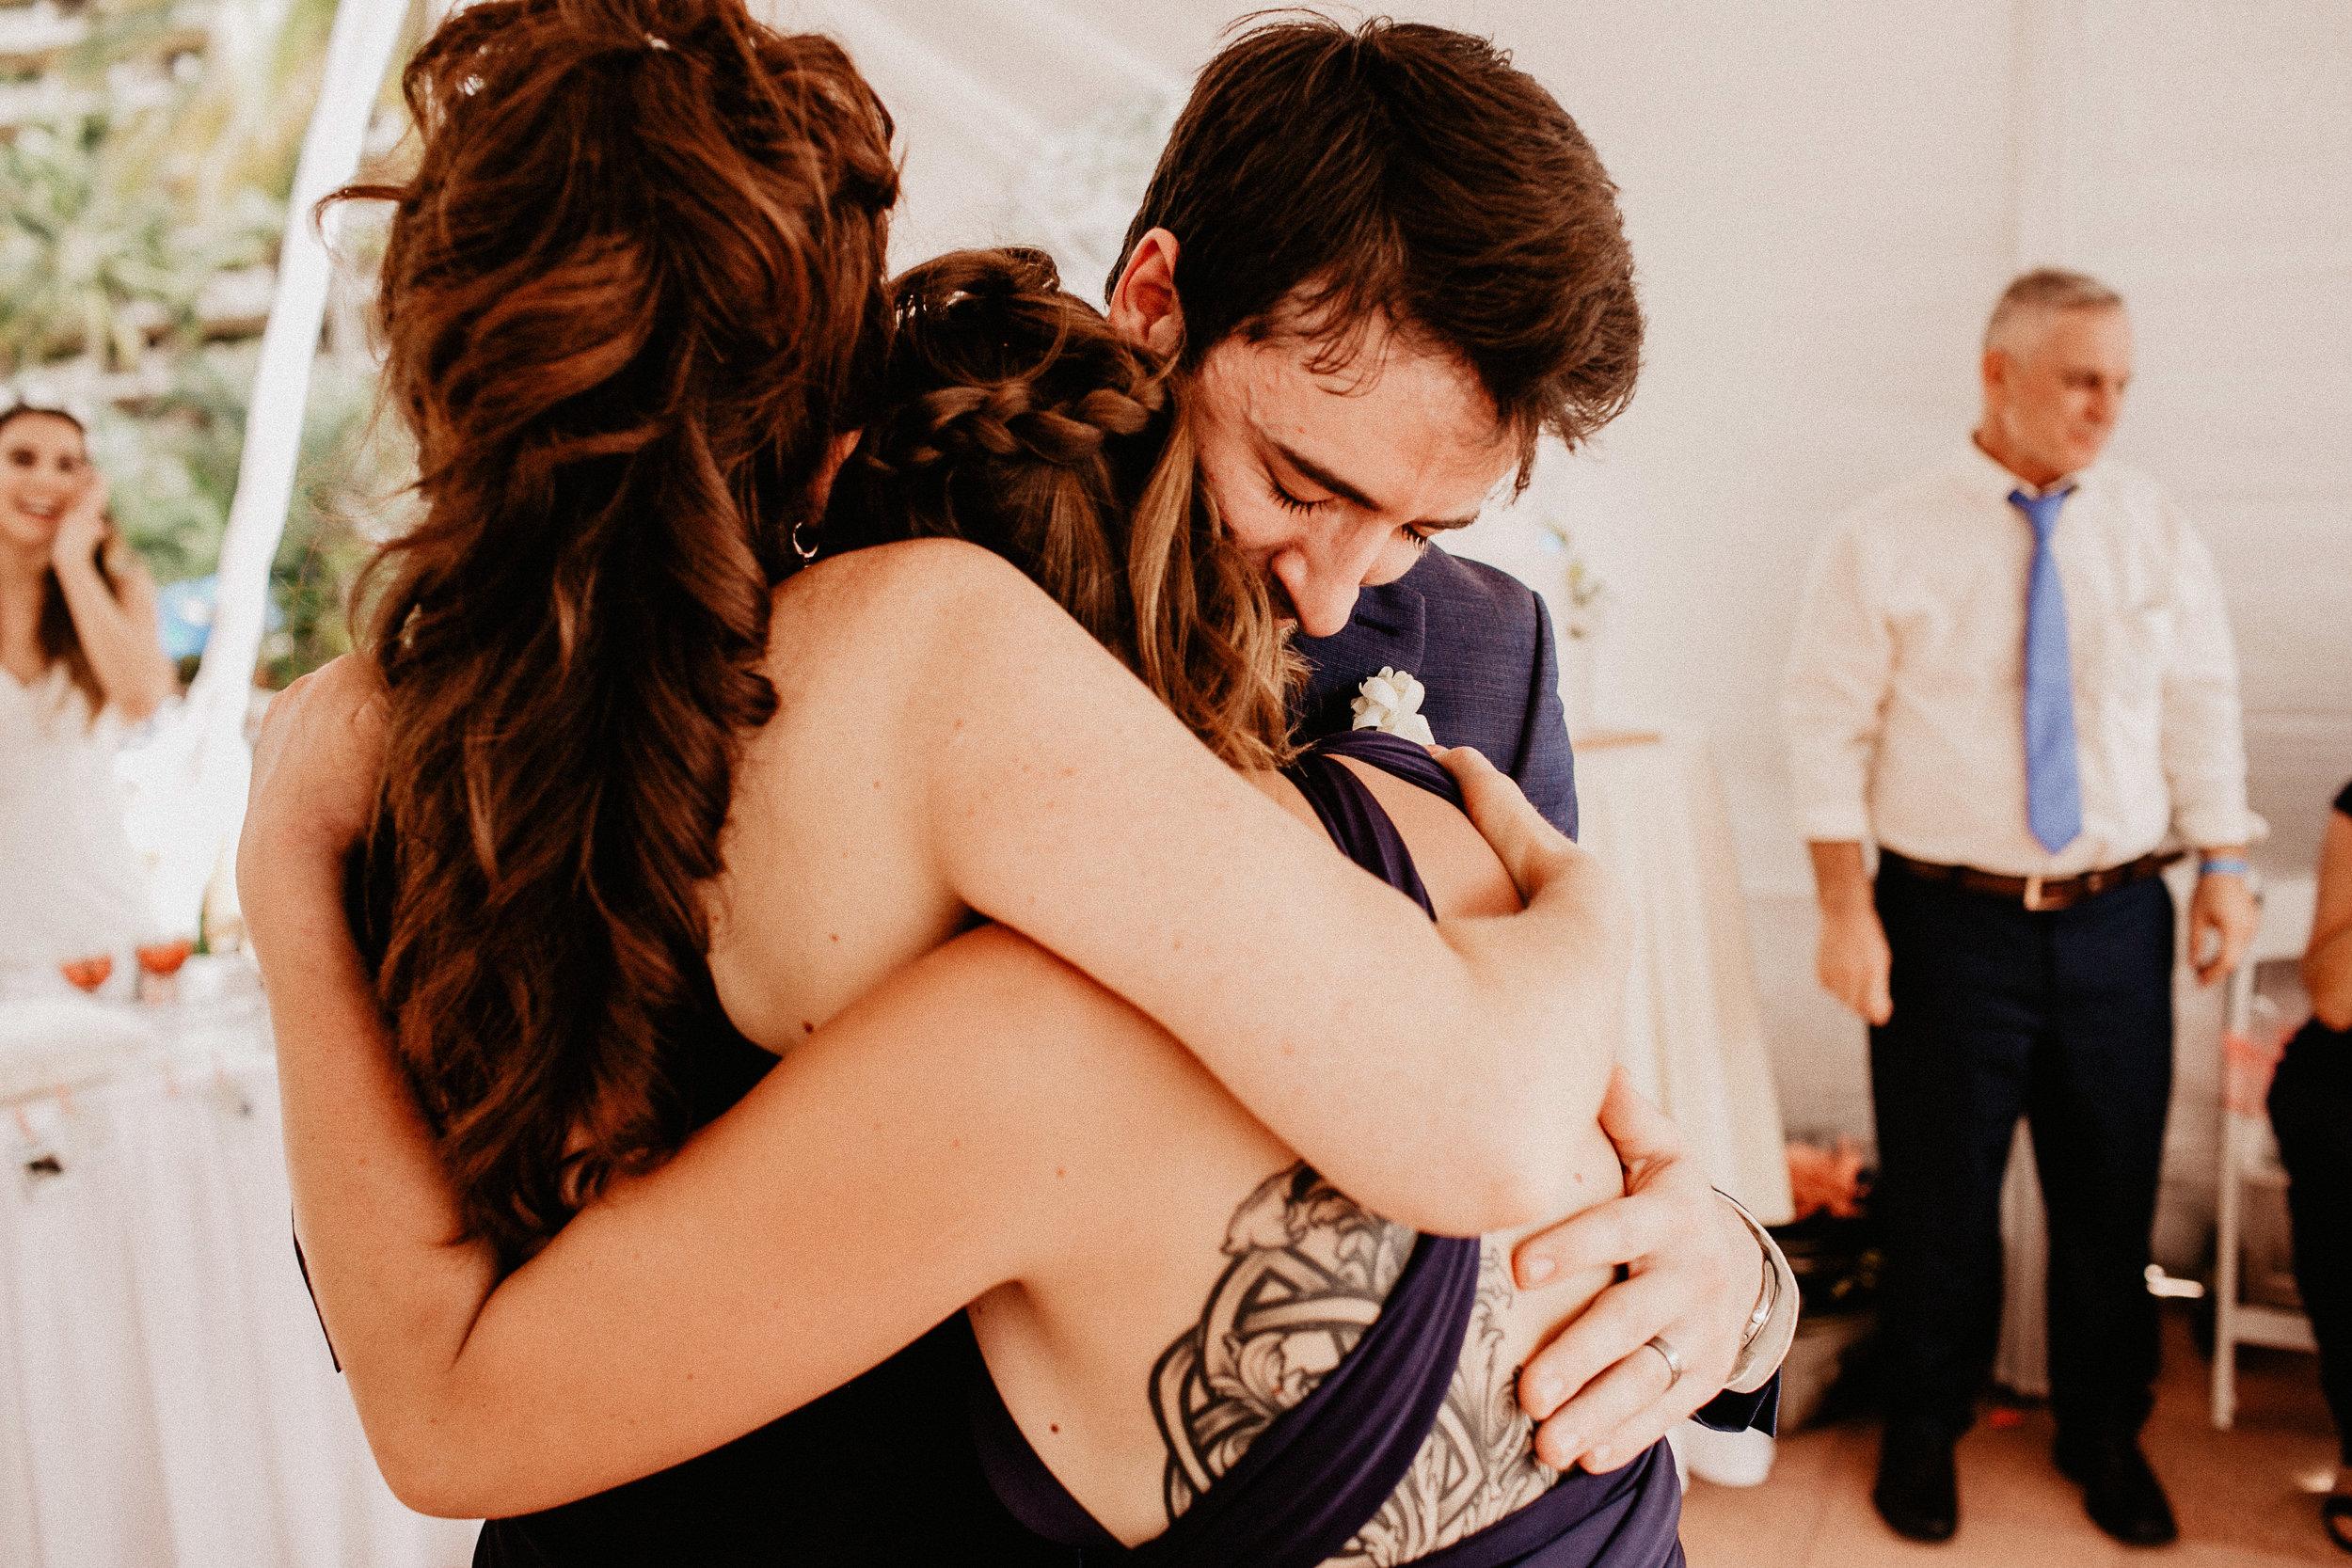 alfonso_flores_destination_wedding_photography_puerto_vallarta_hotel_barcelo_vallarta_cuttler_amela-492.JPG